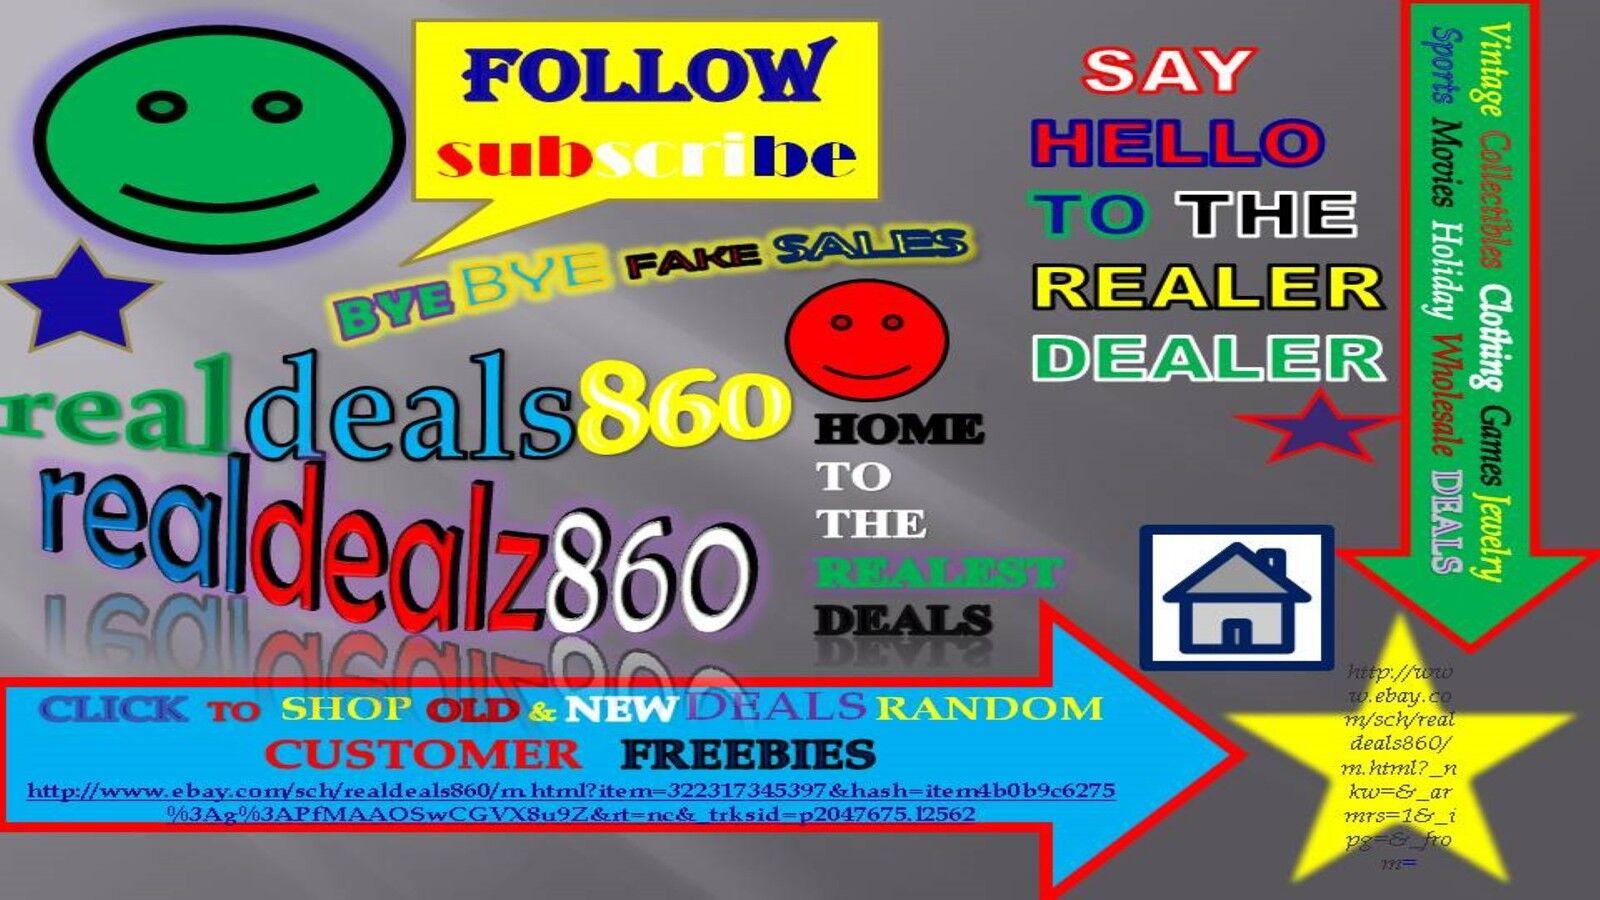 realdealz860